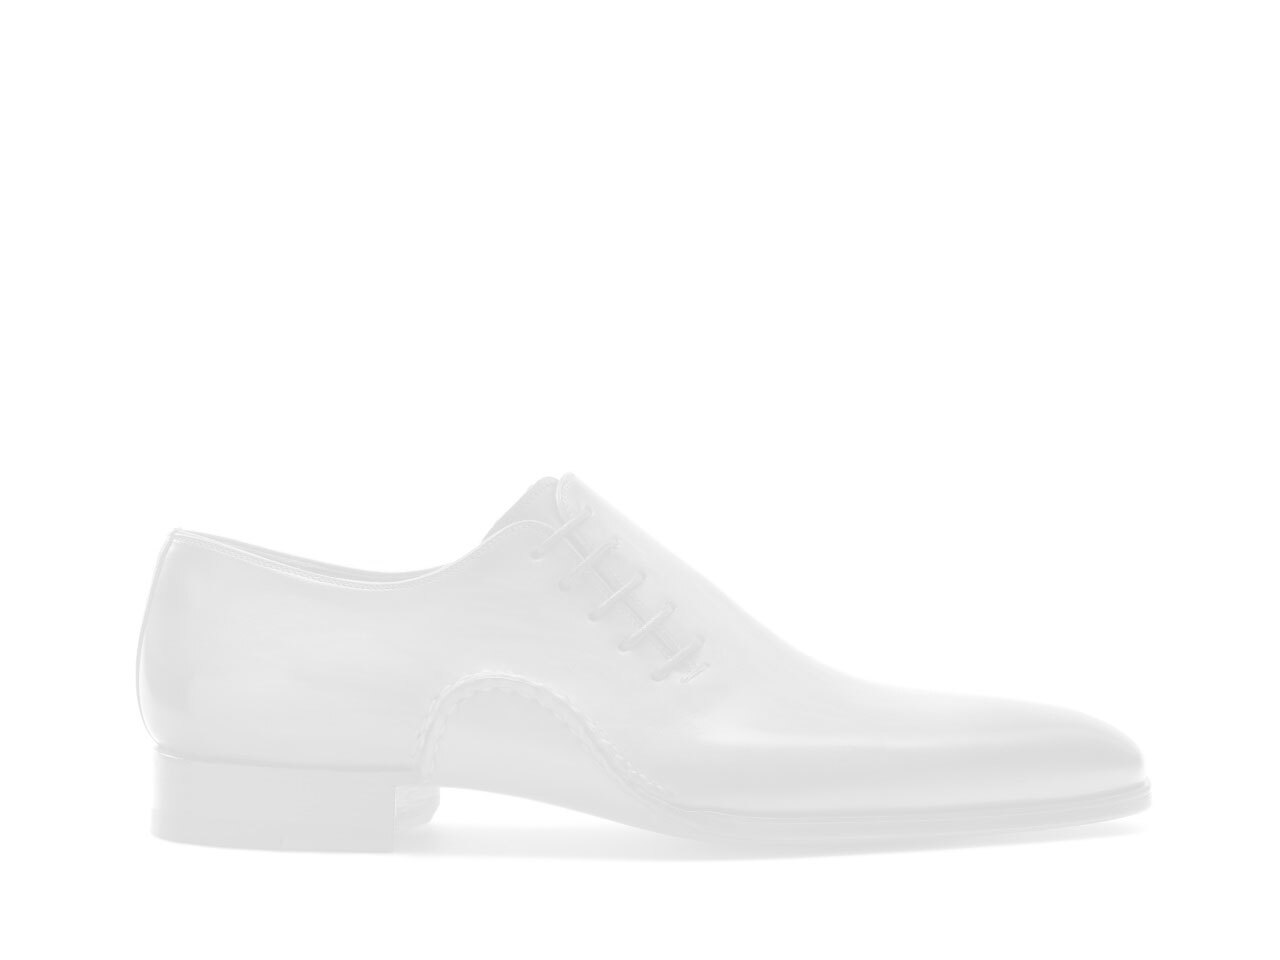 Cuero brown hi-top sneaker shoes for men - Magnanni